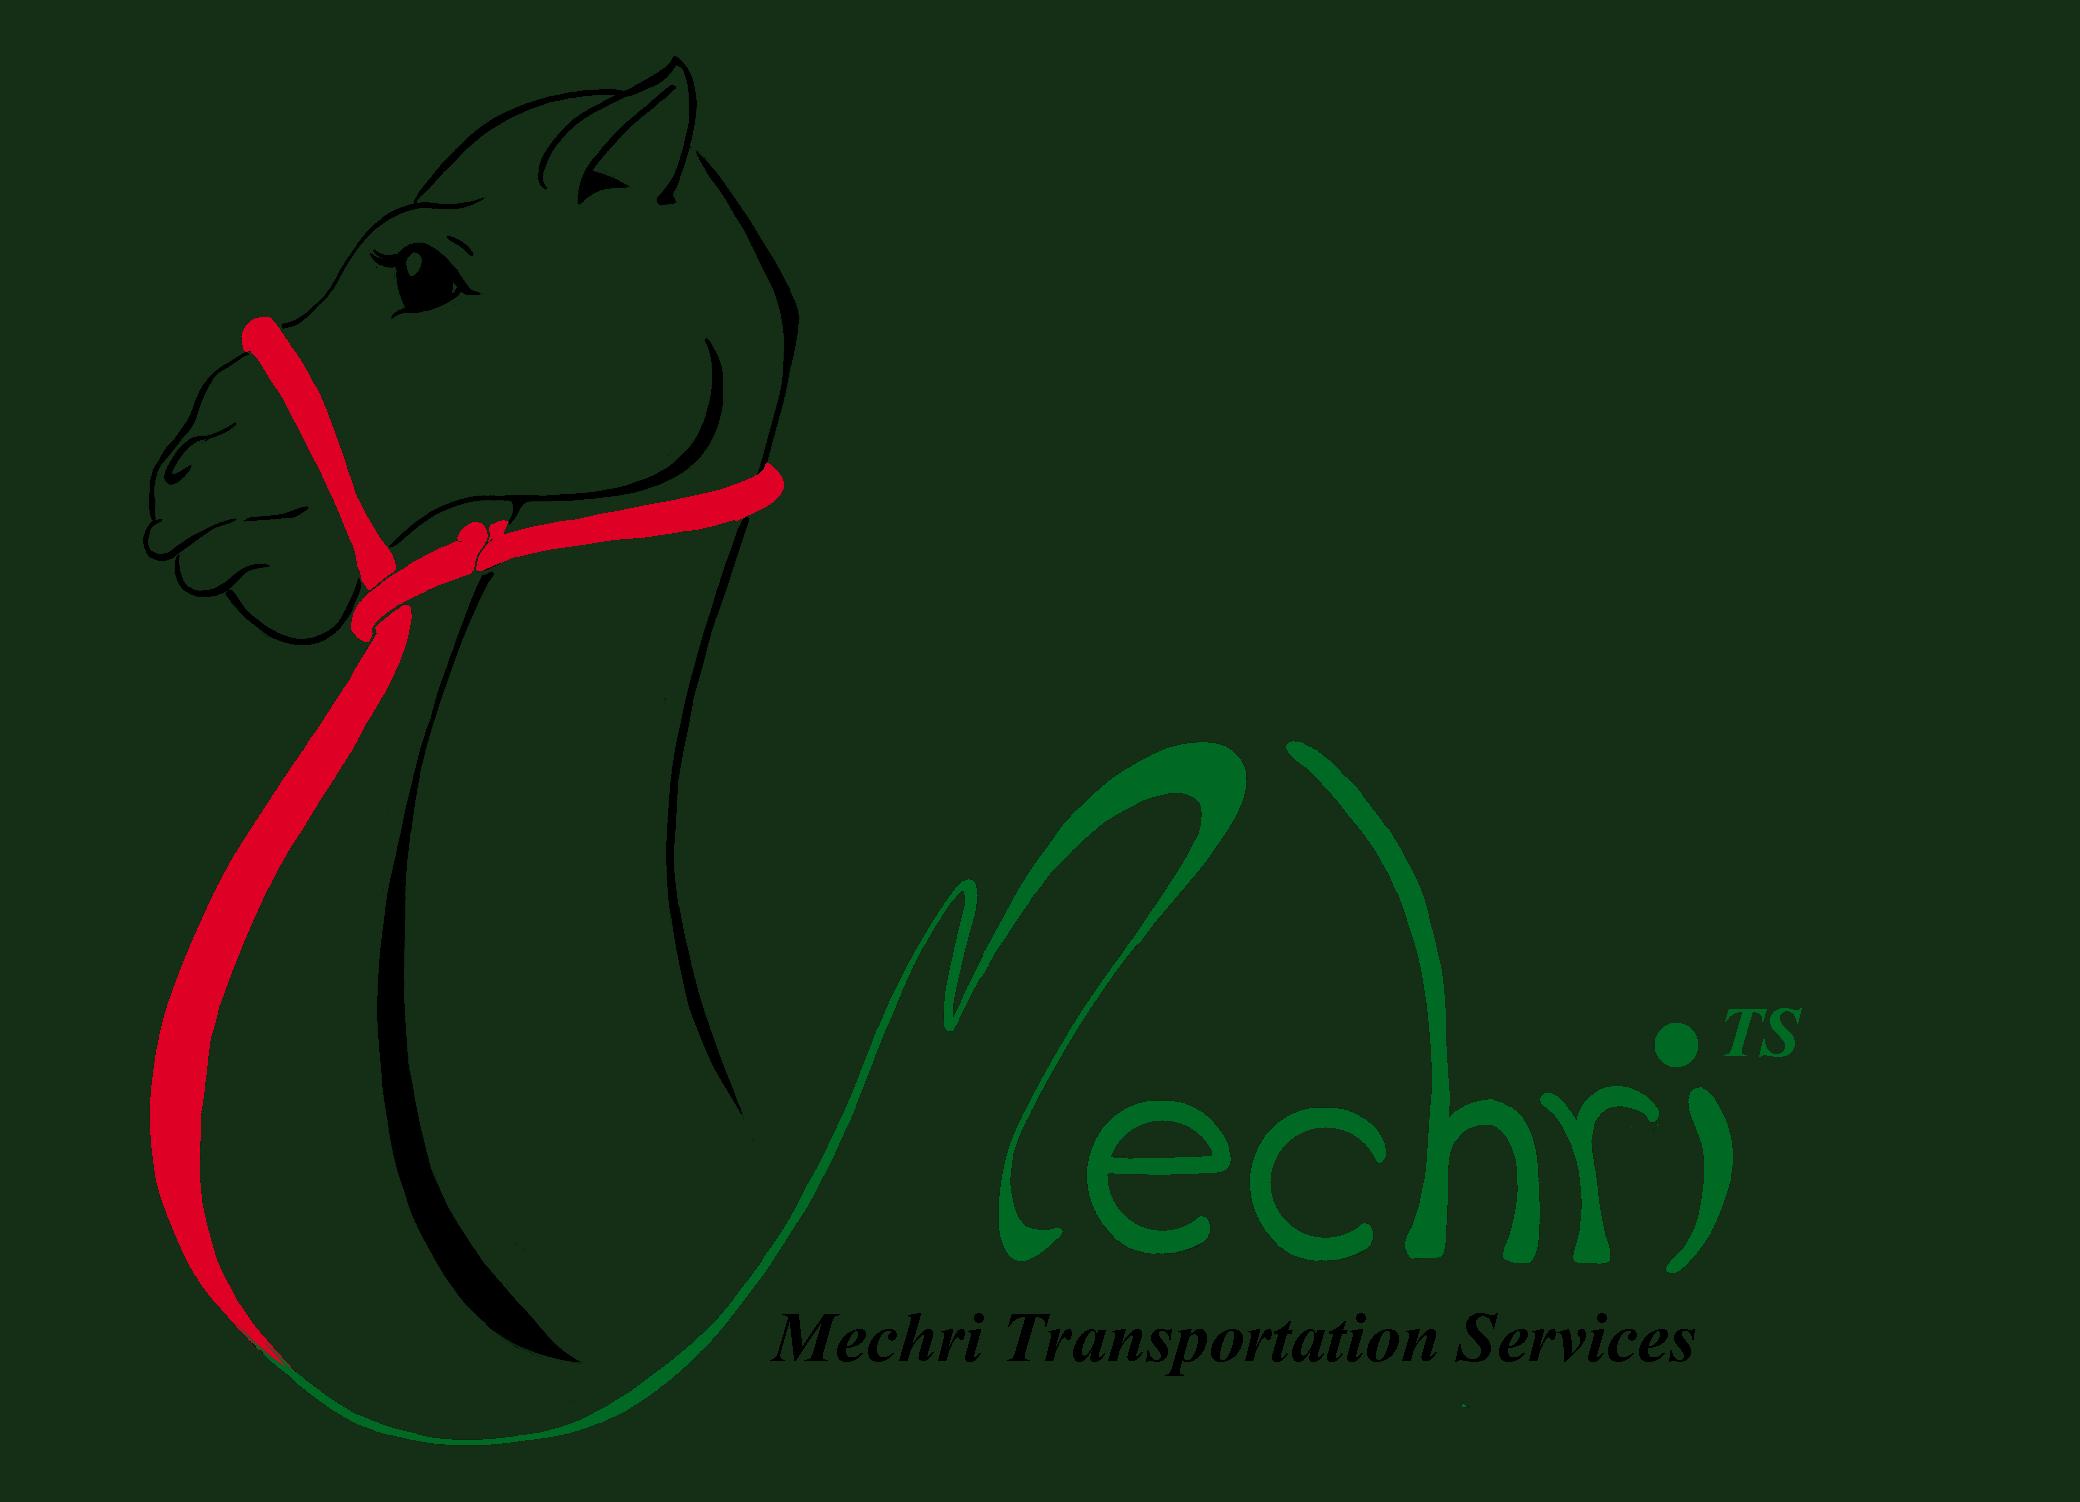 Mechri Transportation Services